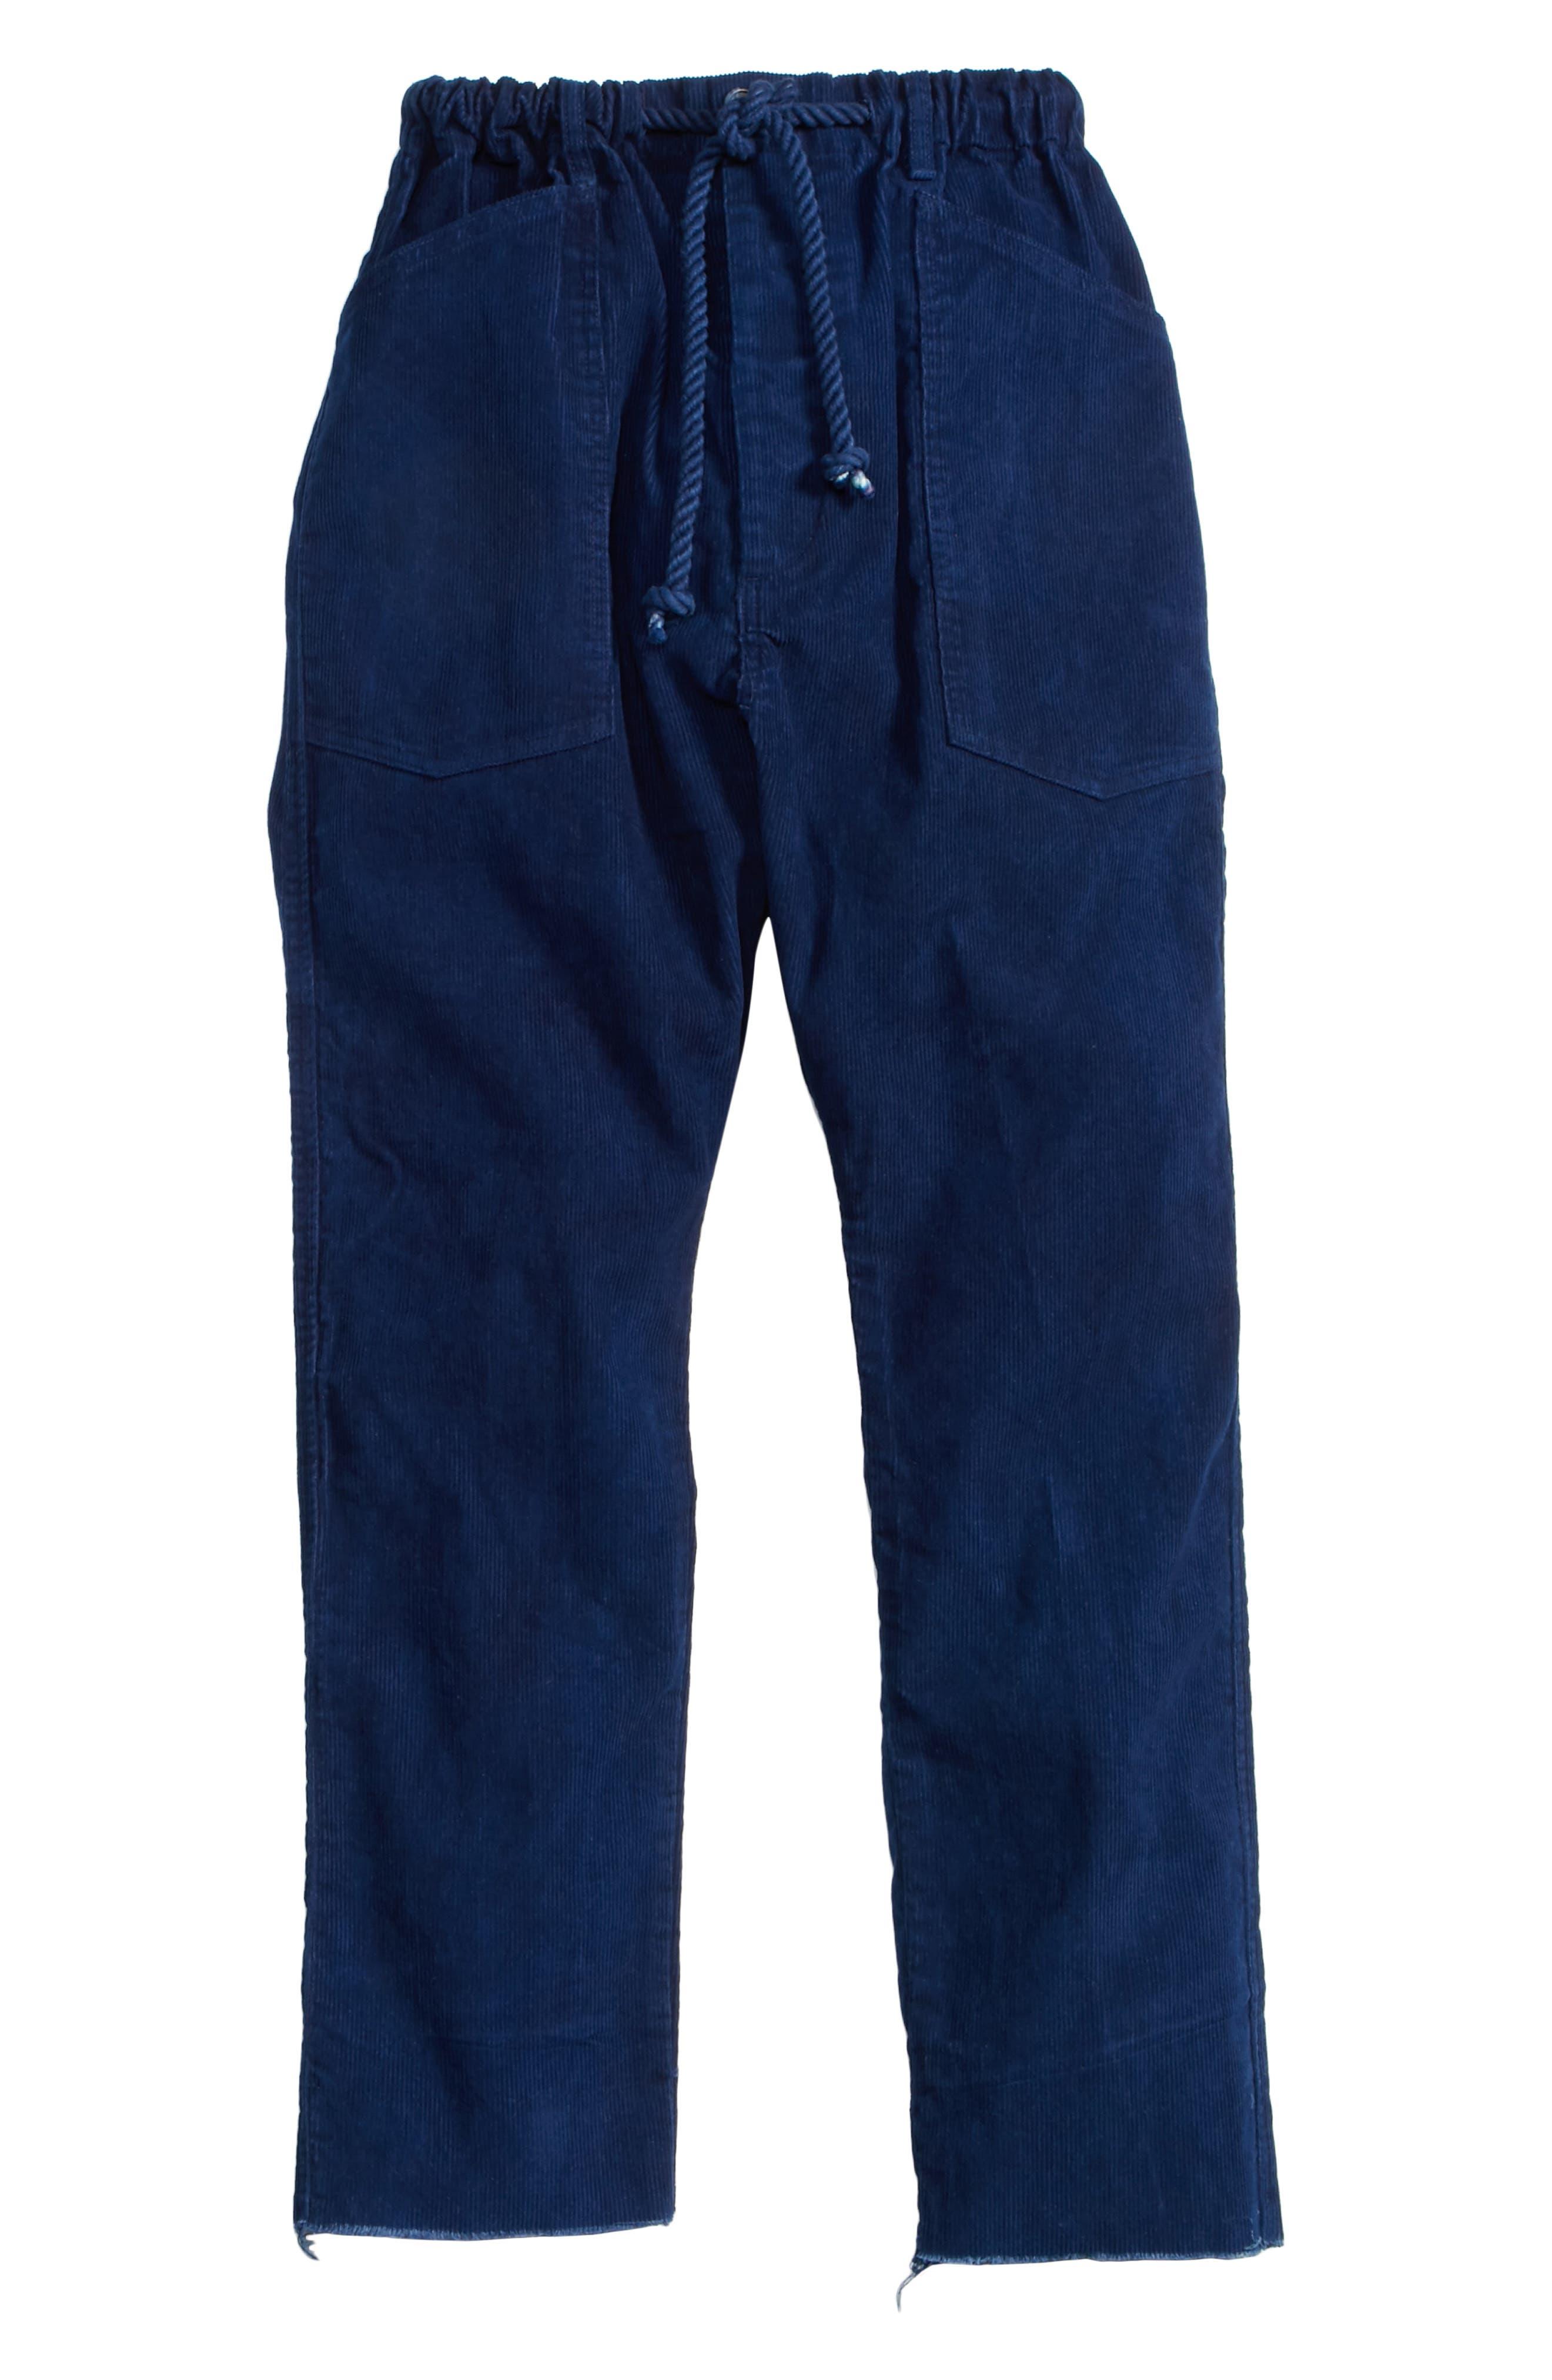 Main Image - Dr. Collectors P23 GI Drop Crotch Corduroy Pants